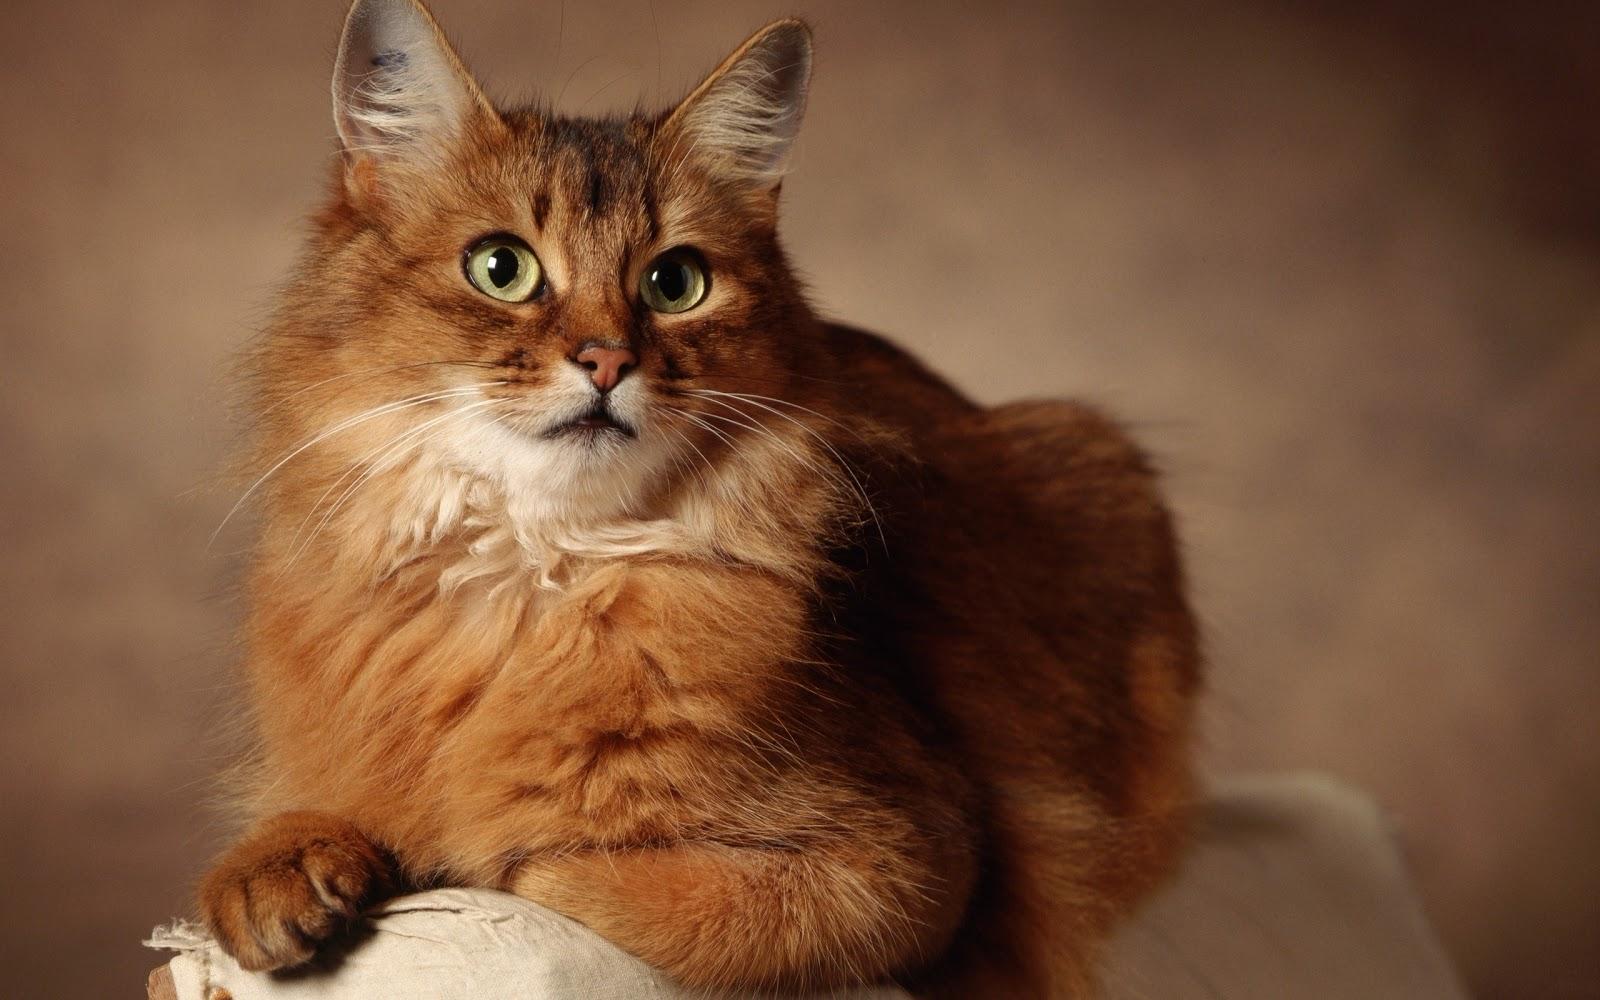 Stupid cat myths